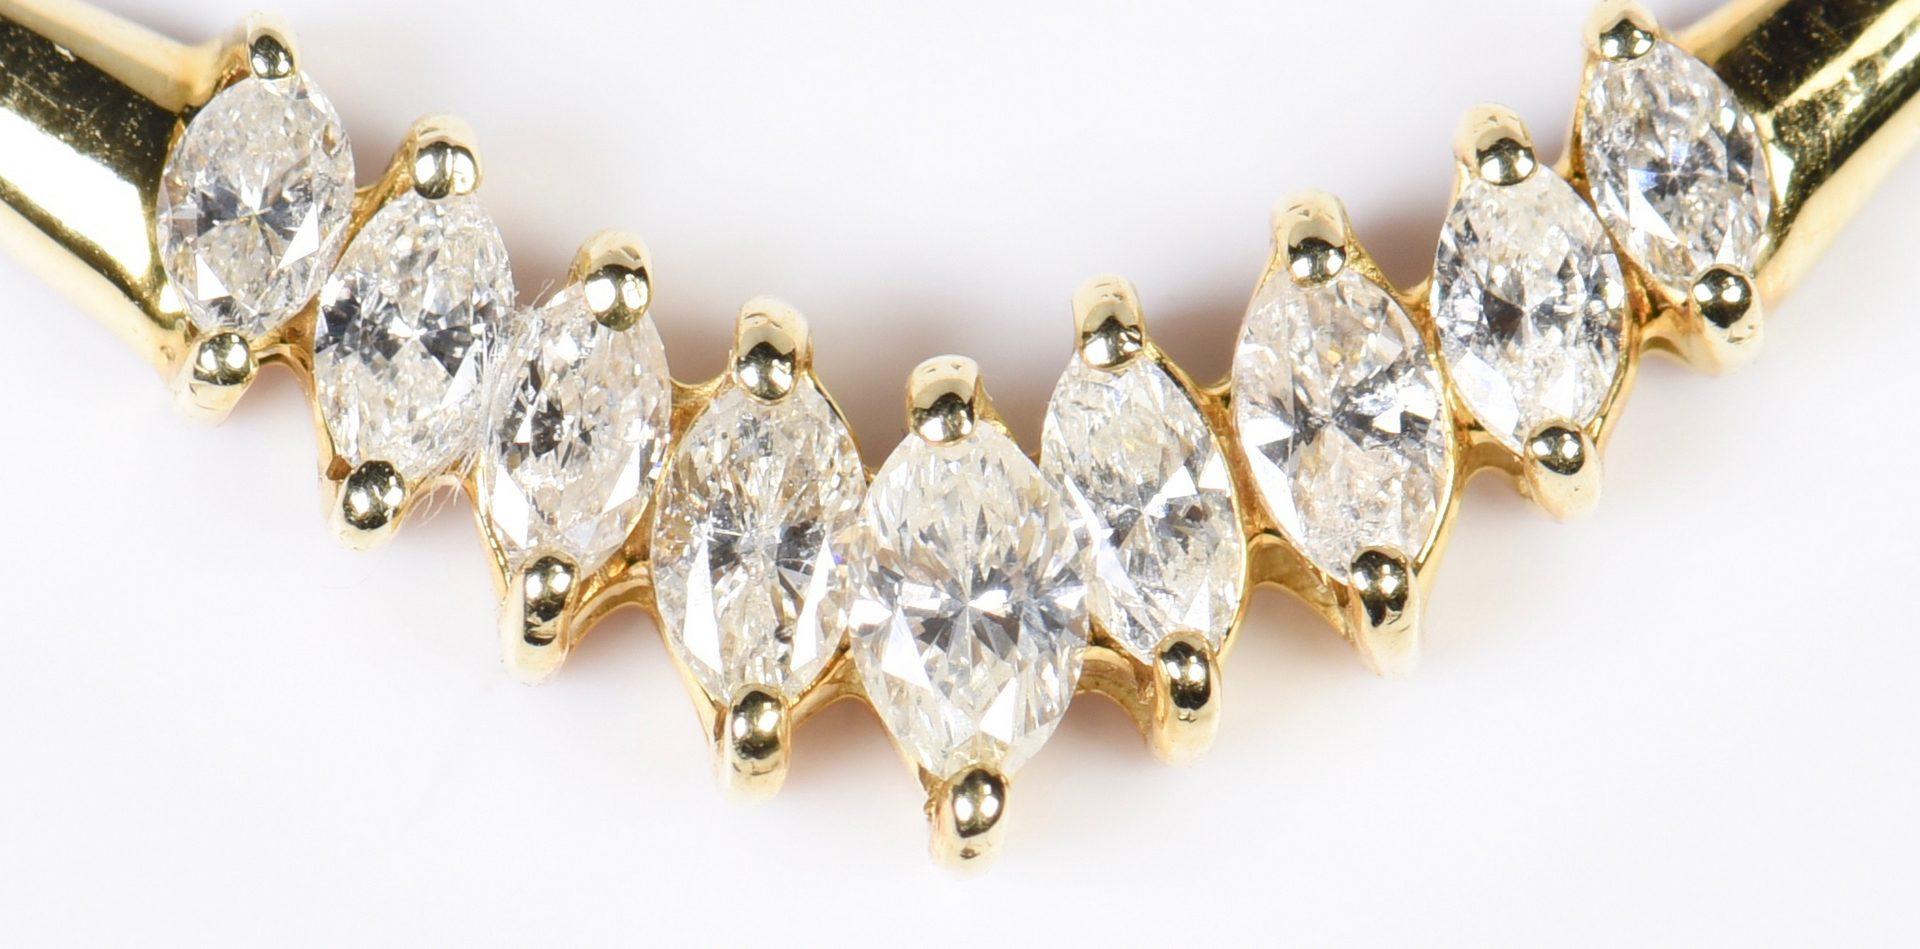 Lot 952: 14K White Gold & Precious Stone Jewelry